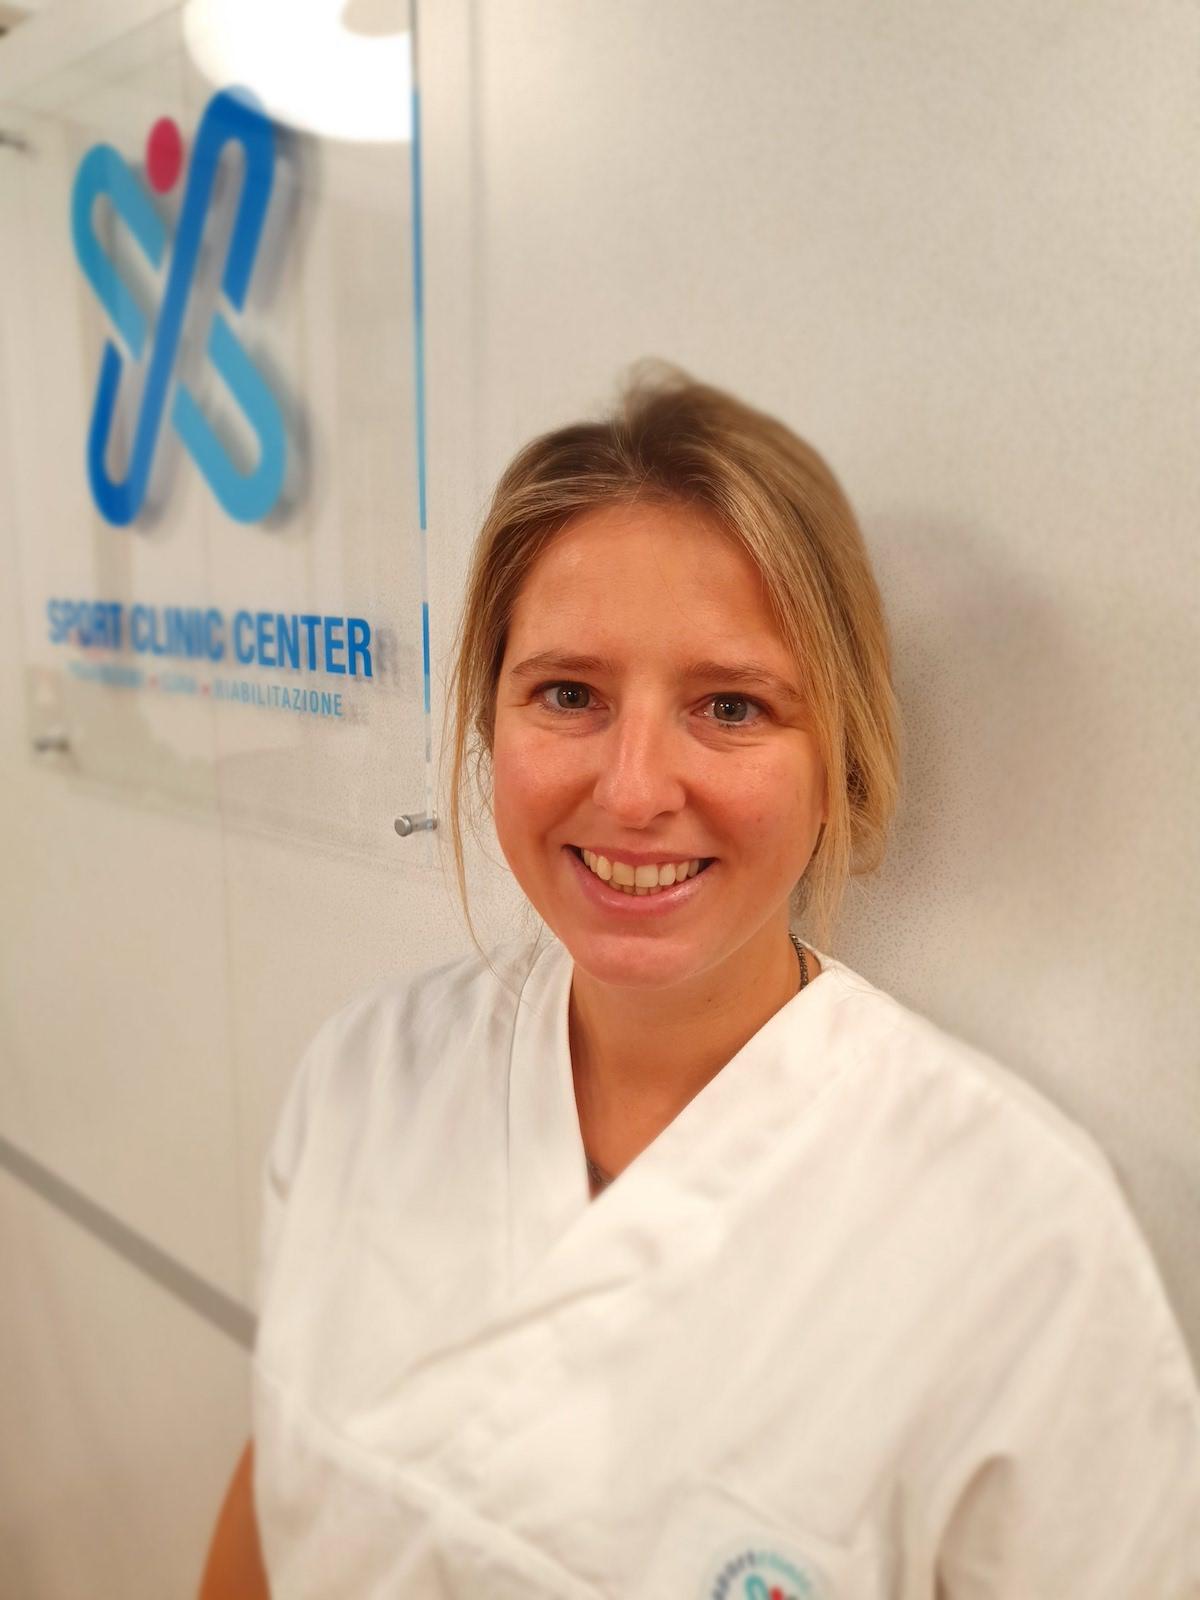 dottoressa Martina Morris presso Sport Clinic Center